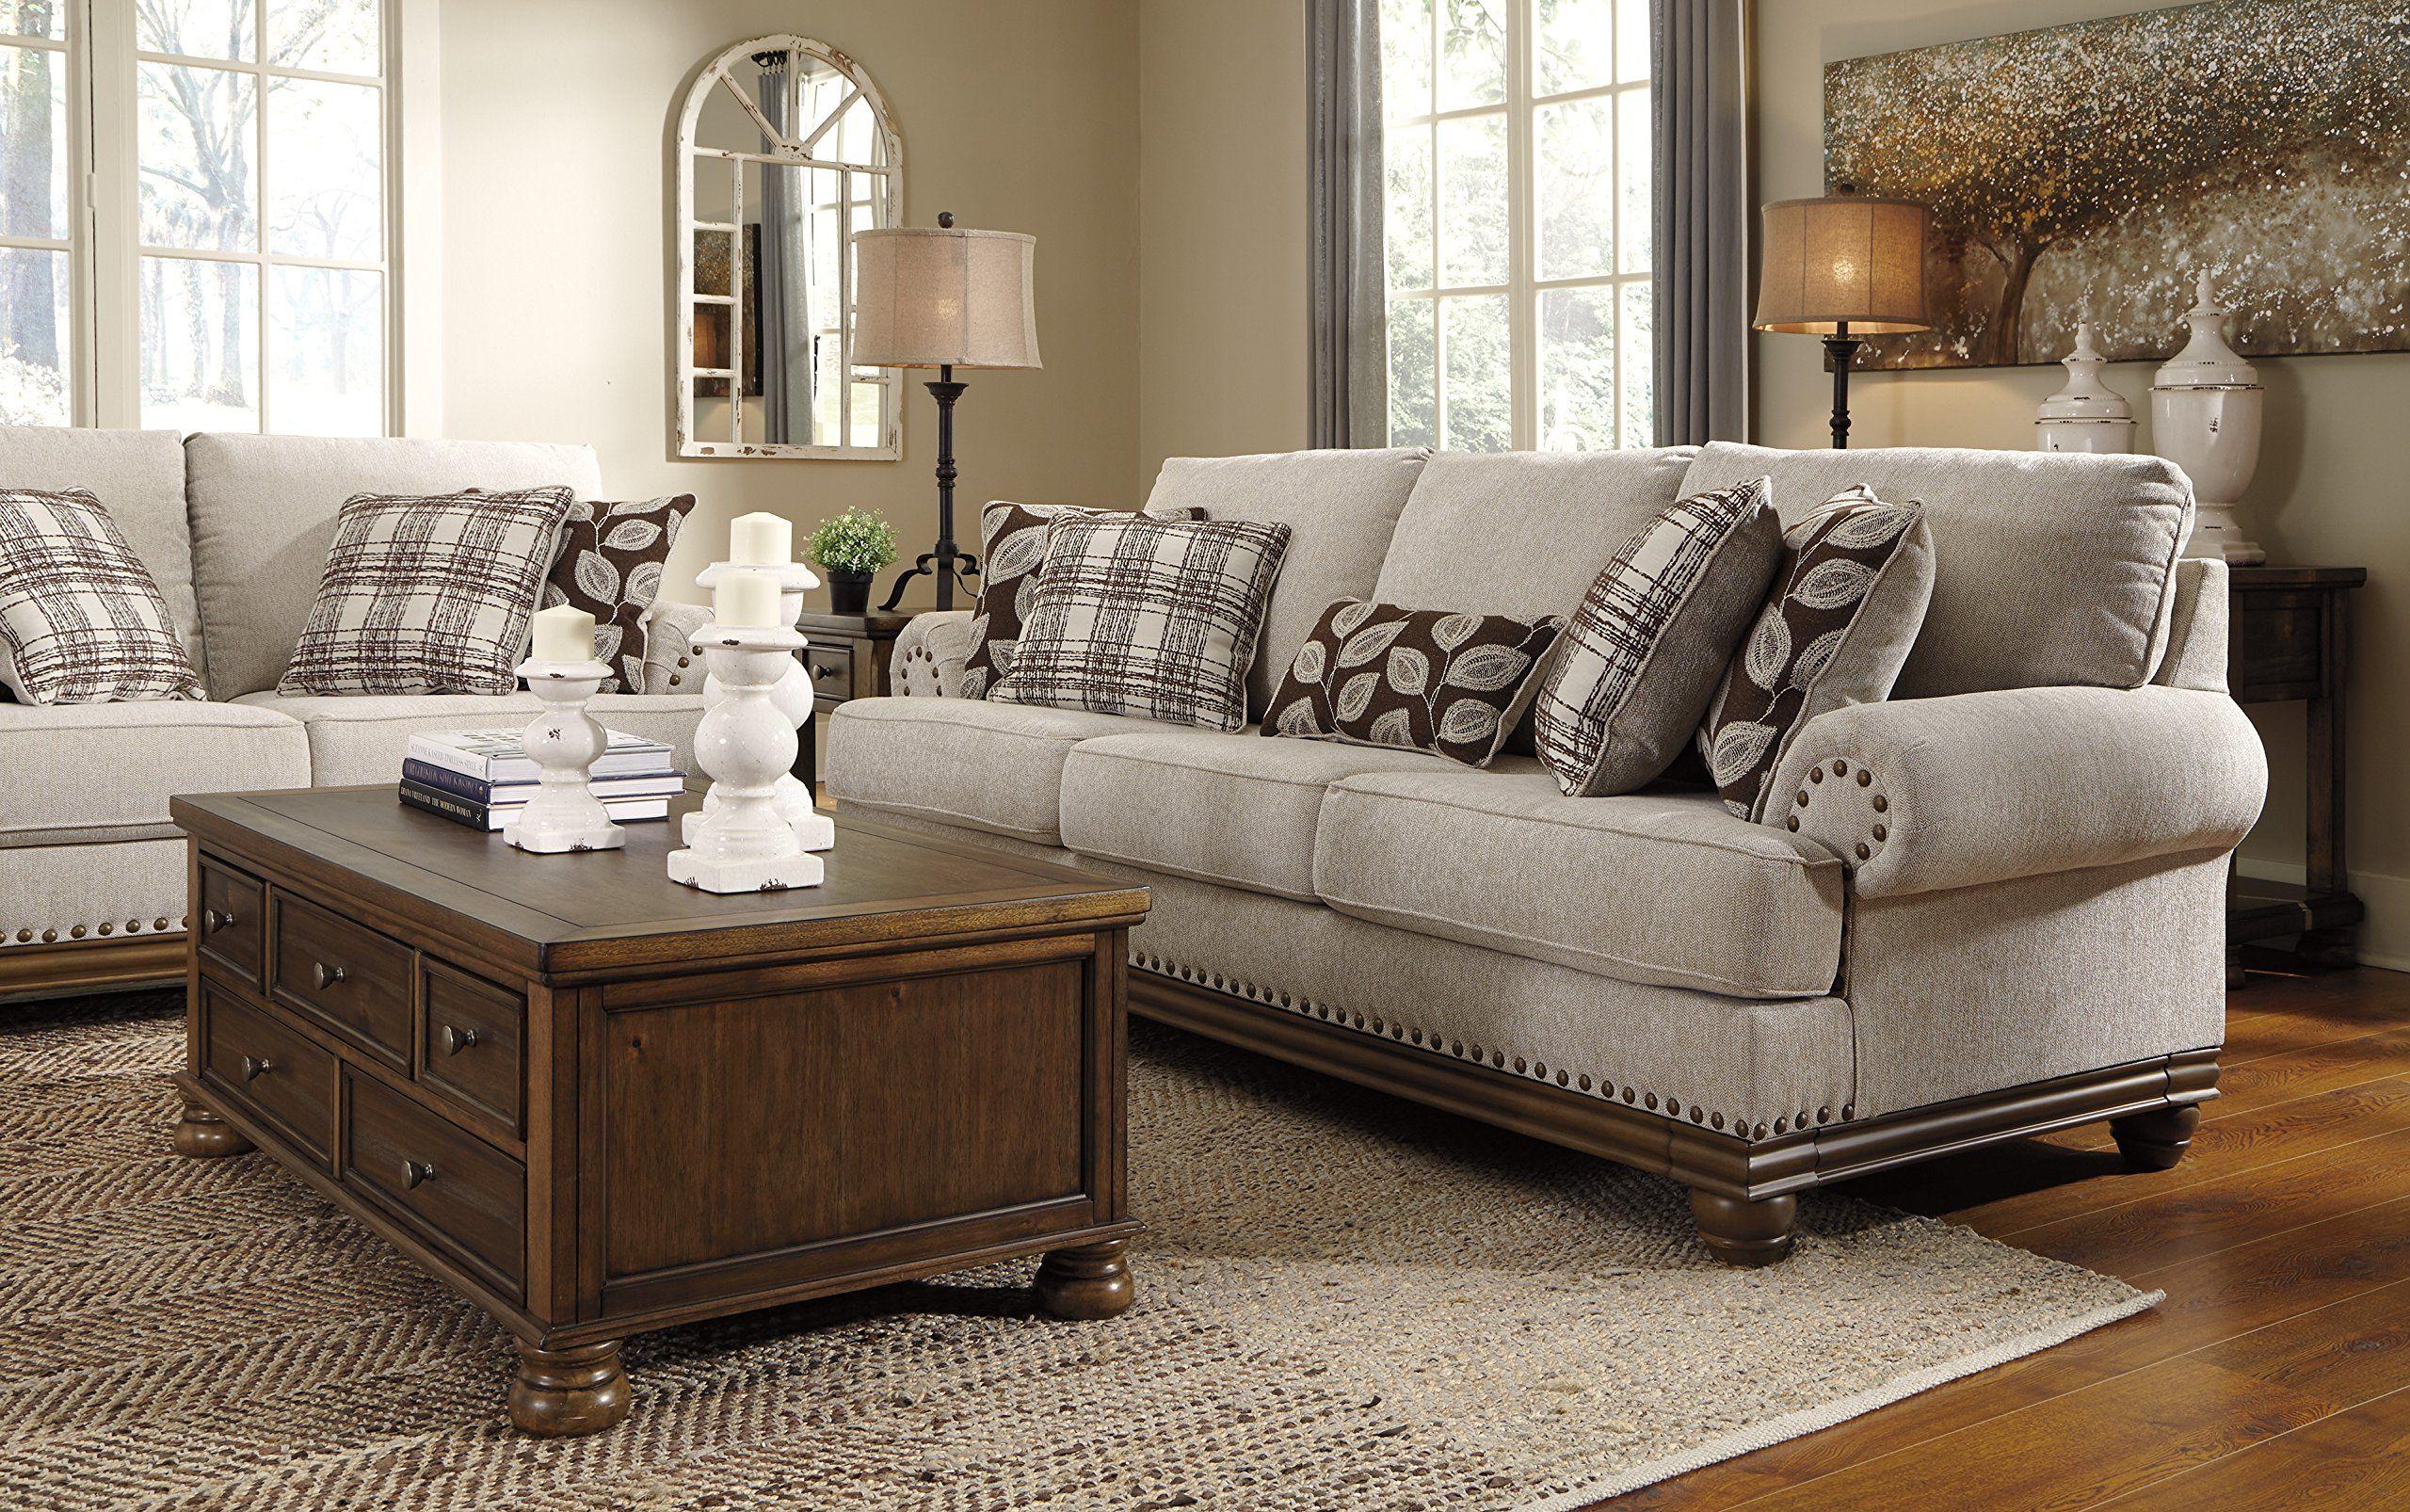 Ashley Furniture Signature Design Harleson Traditional Upholstered